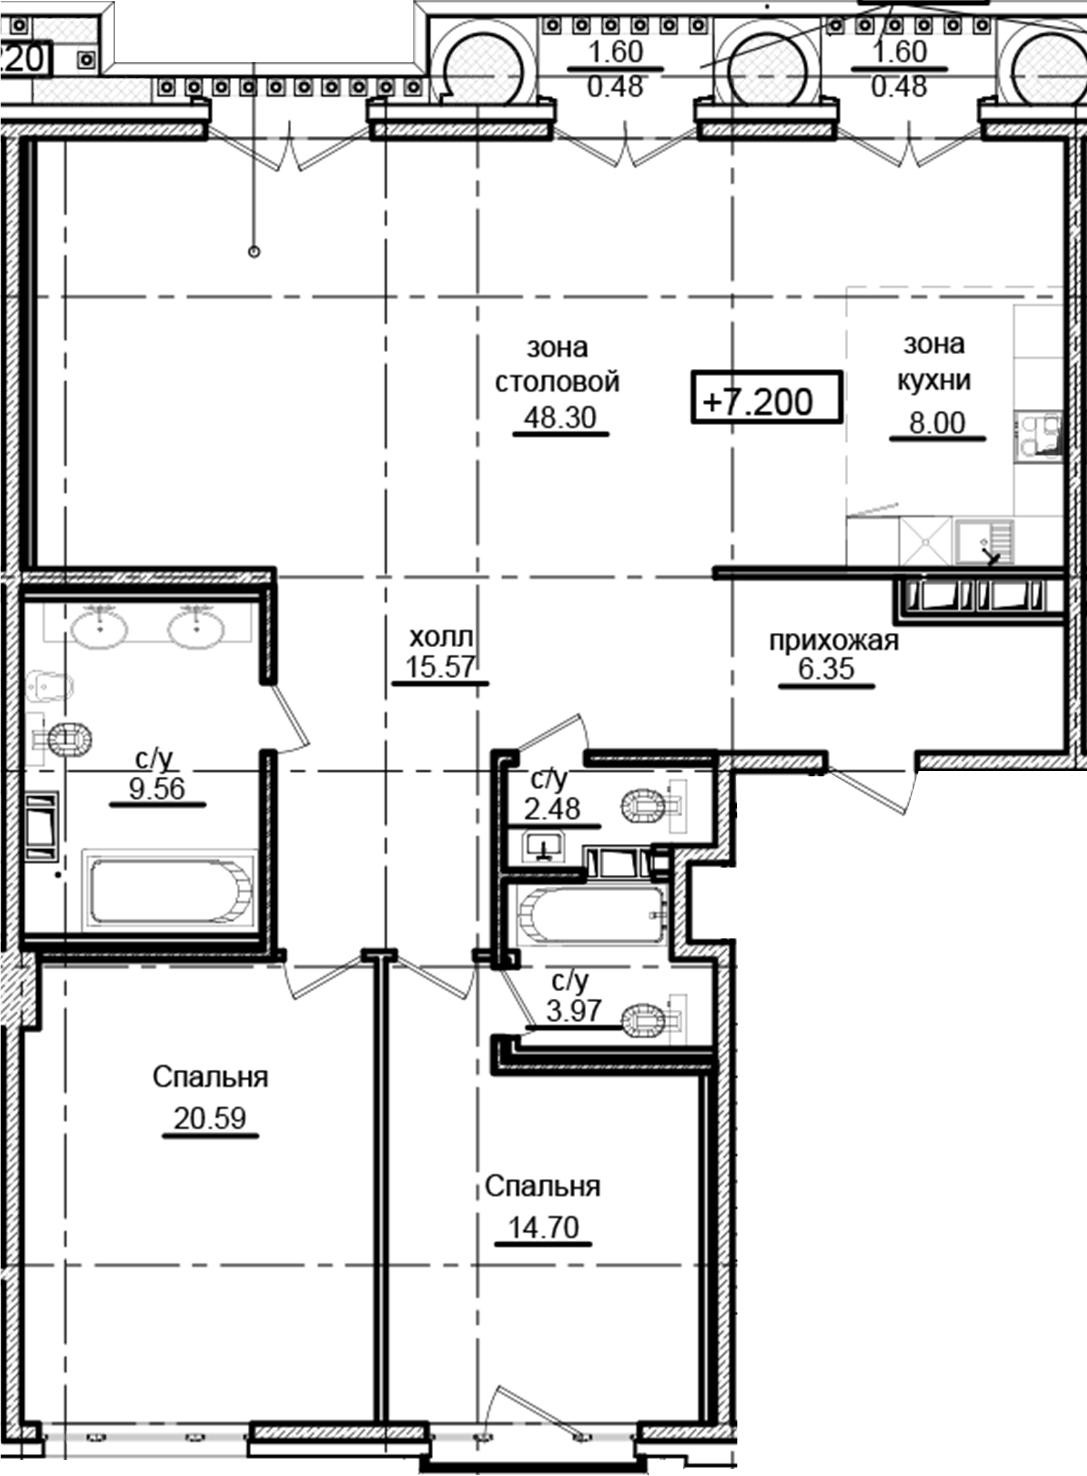 3Е-к.кв, 130.48 м²